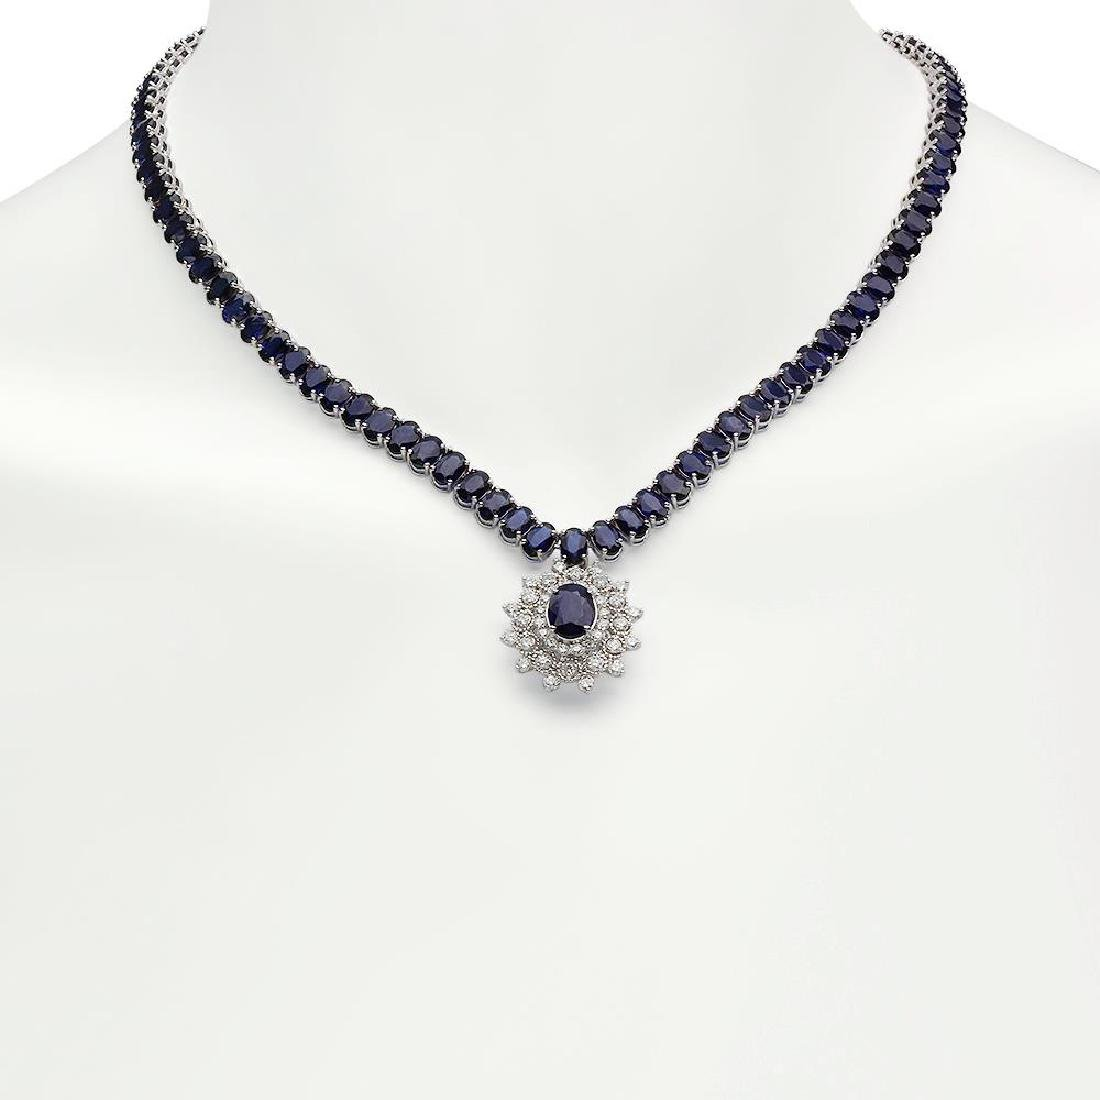 14K Gold 54.01ct Sapphire 2.67ct Diamond Necklace